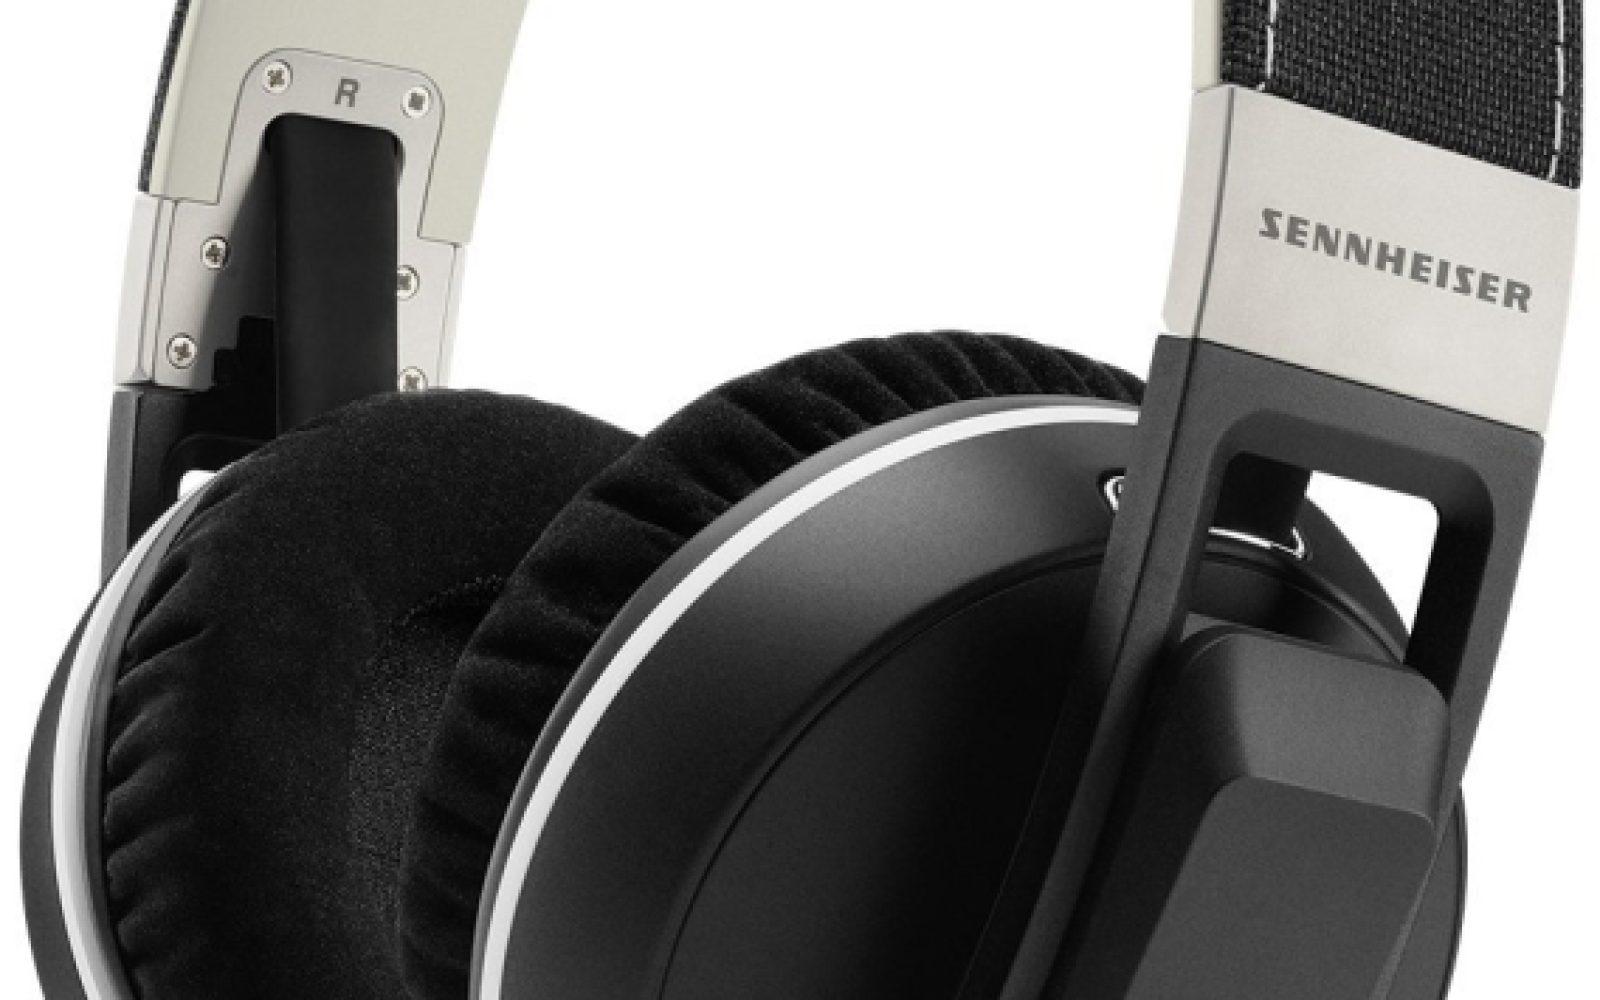 f531ead3adc Sennheiser Urbanite XL Over-Ear Headphones for iOS w/ $10 Focus Camera GC  $190 shipped (Reg. $250)